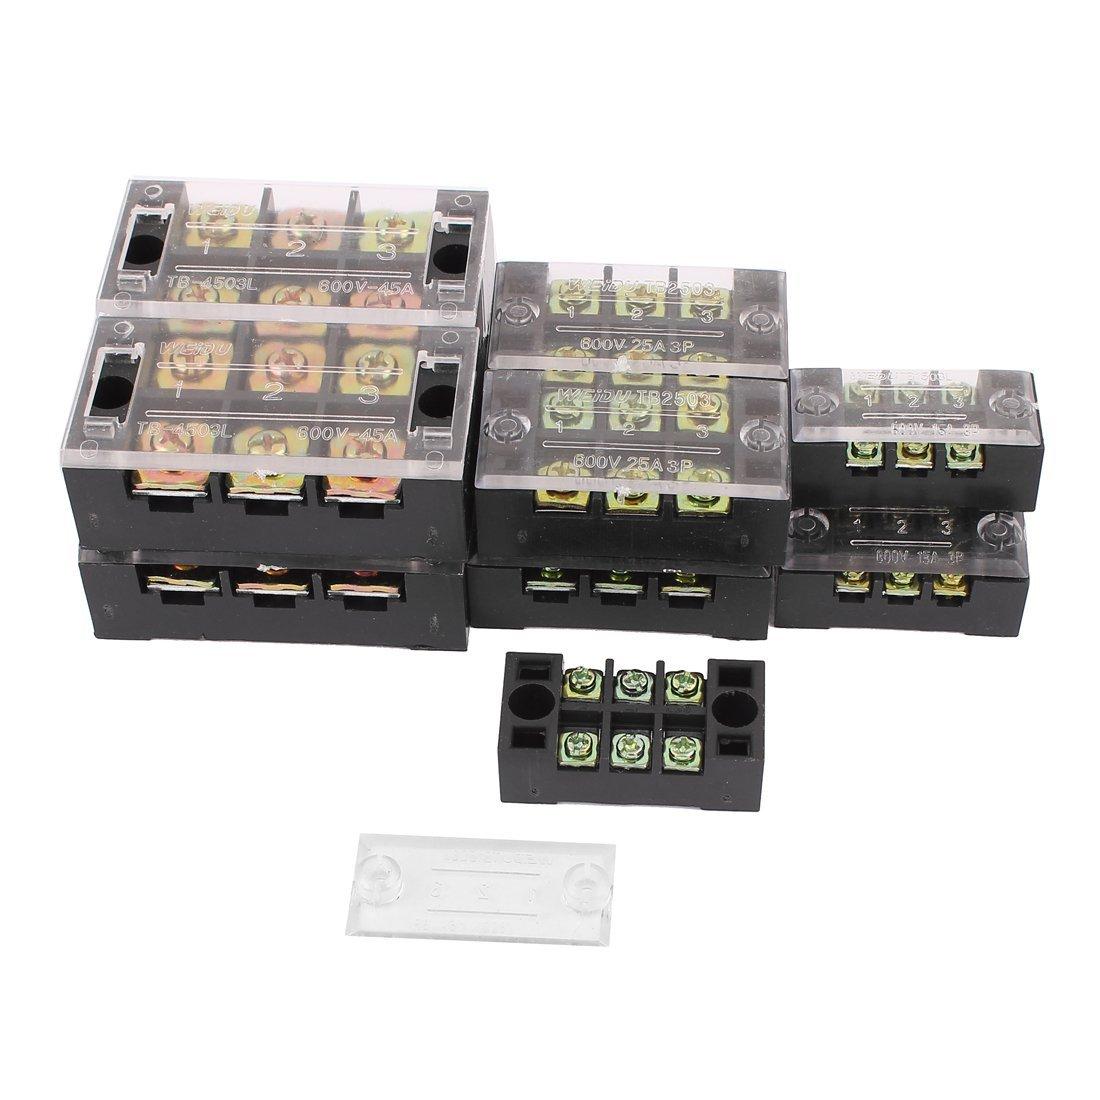 Aexit Dual Row 3 Position Screw Terminal Strip 600V 15A/25A/45A 12pcs